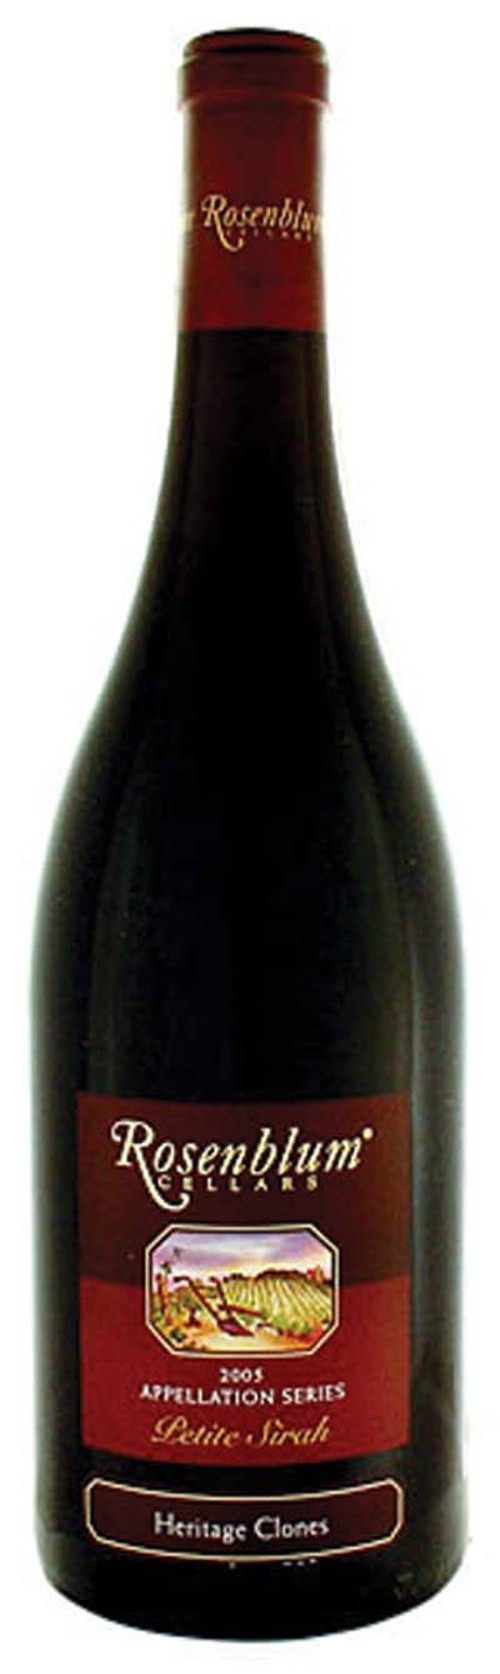 drink_090402_c.jpg